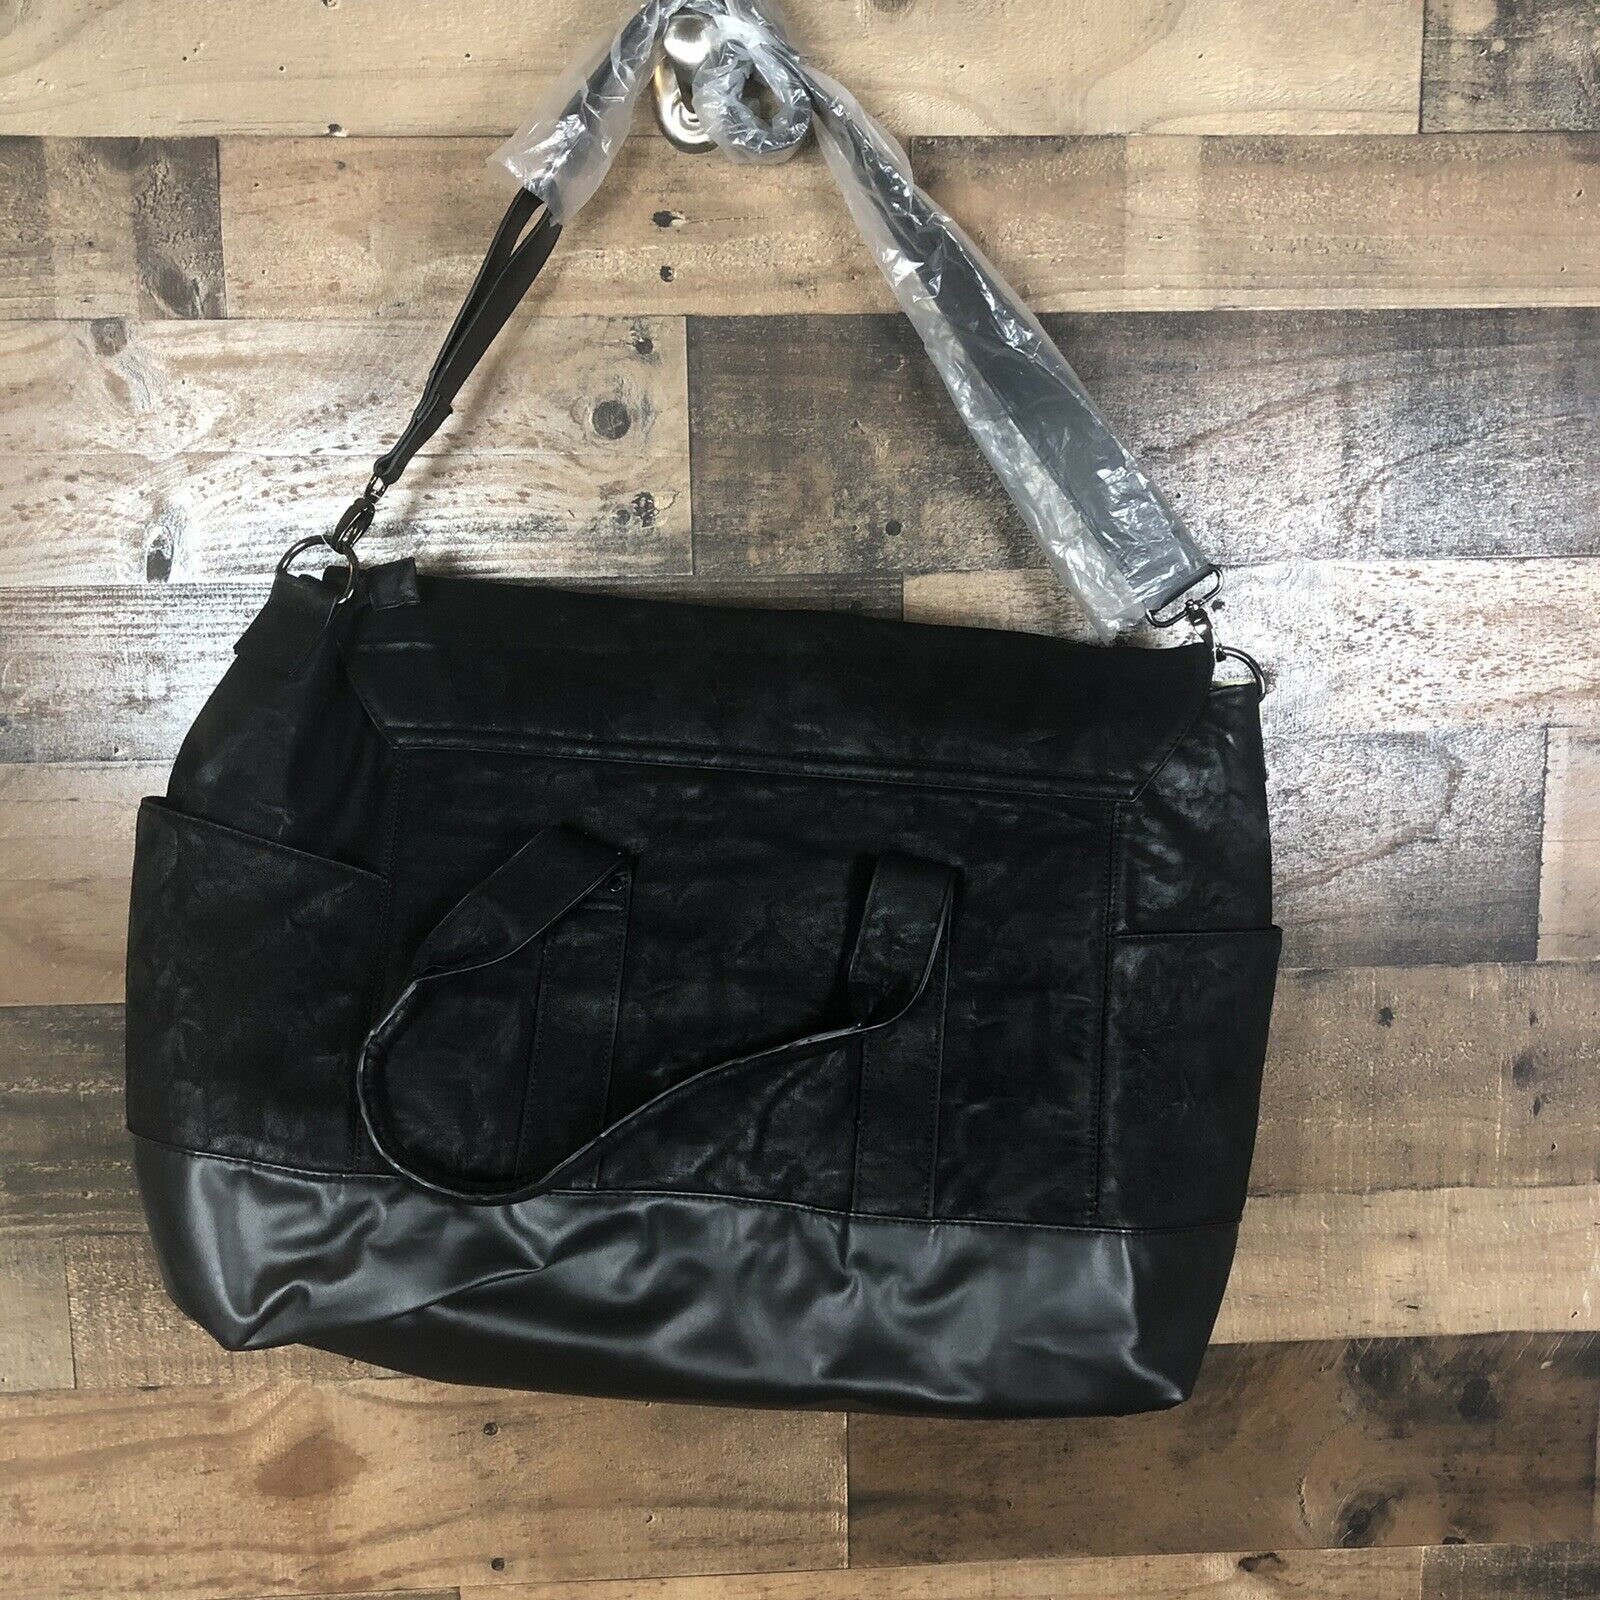 Target Black Limited Edition Travel Bag NWT